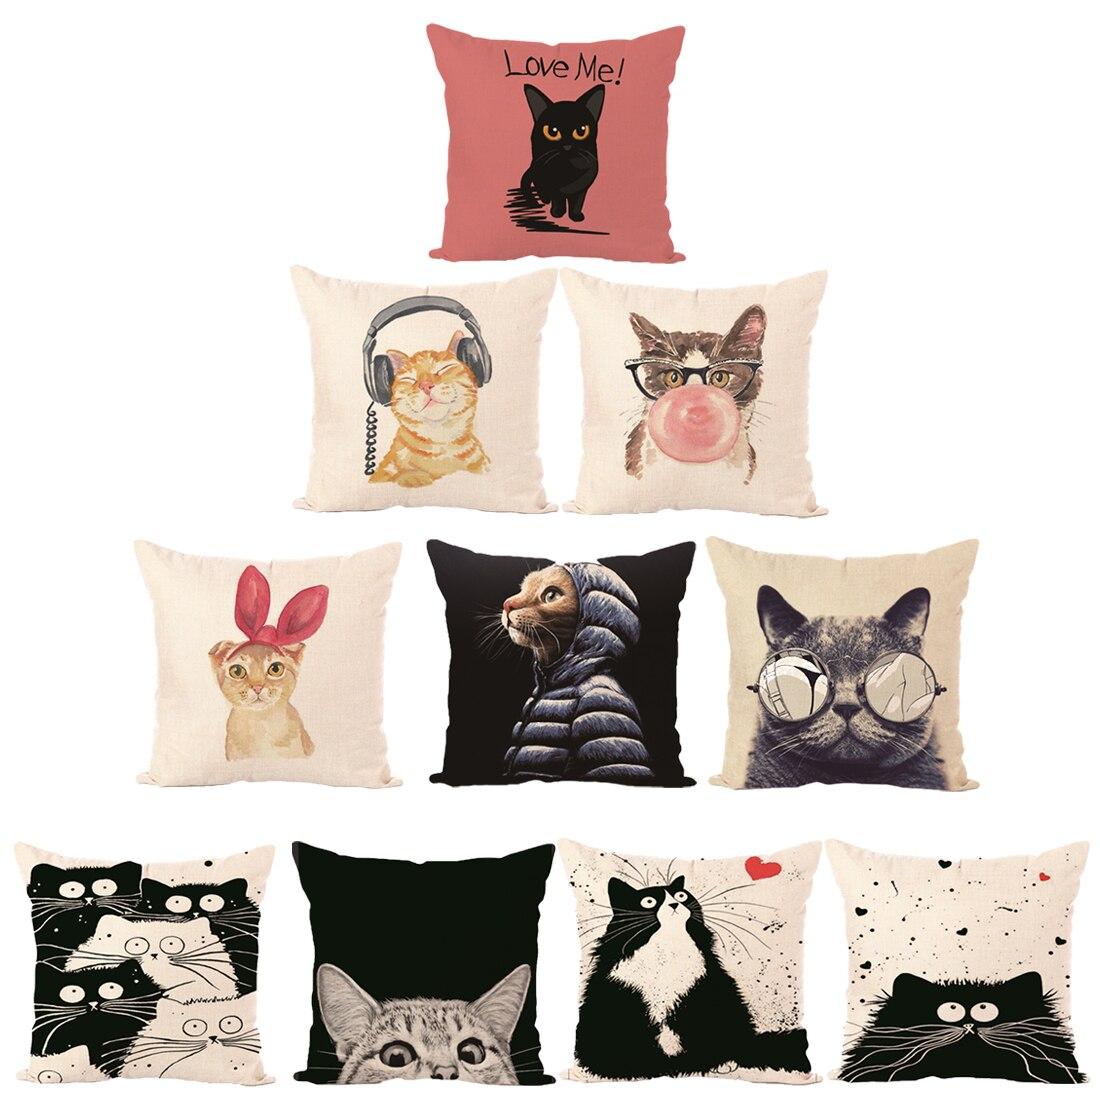 Cute Lovely Cat Decorative Cushion Cover Cotton Linen Square Throw Pillow Cover 45x45CM Pillow Case Home Office Car Sofa Decor